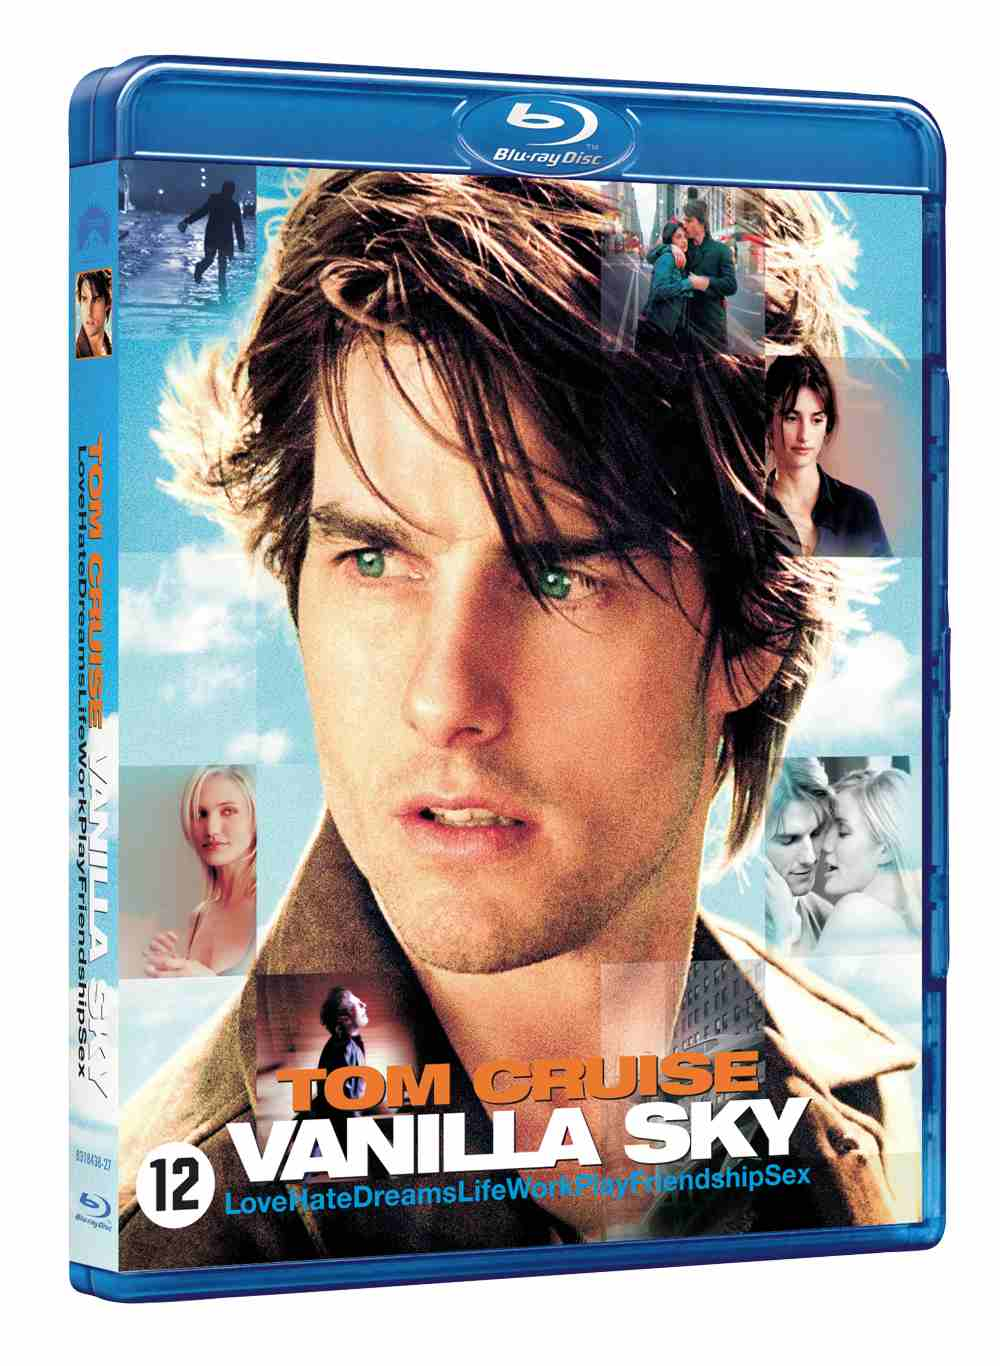 Vanilla Sky, Universal